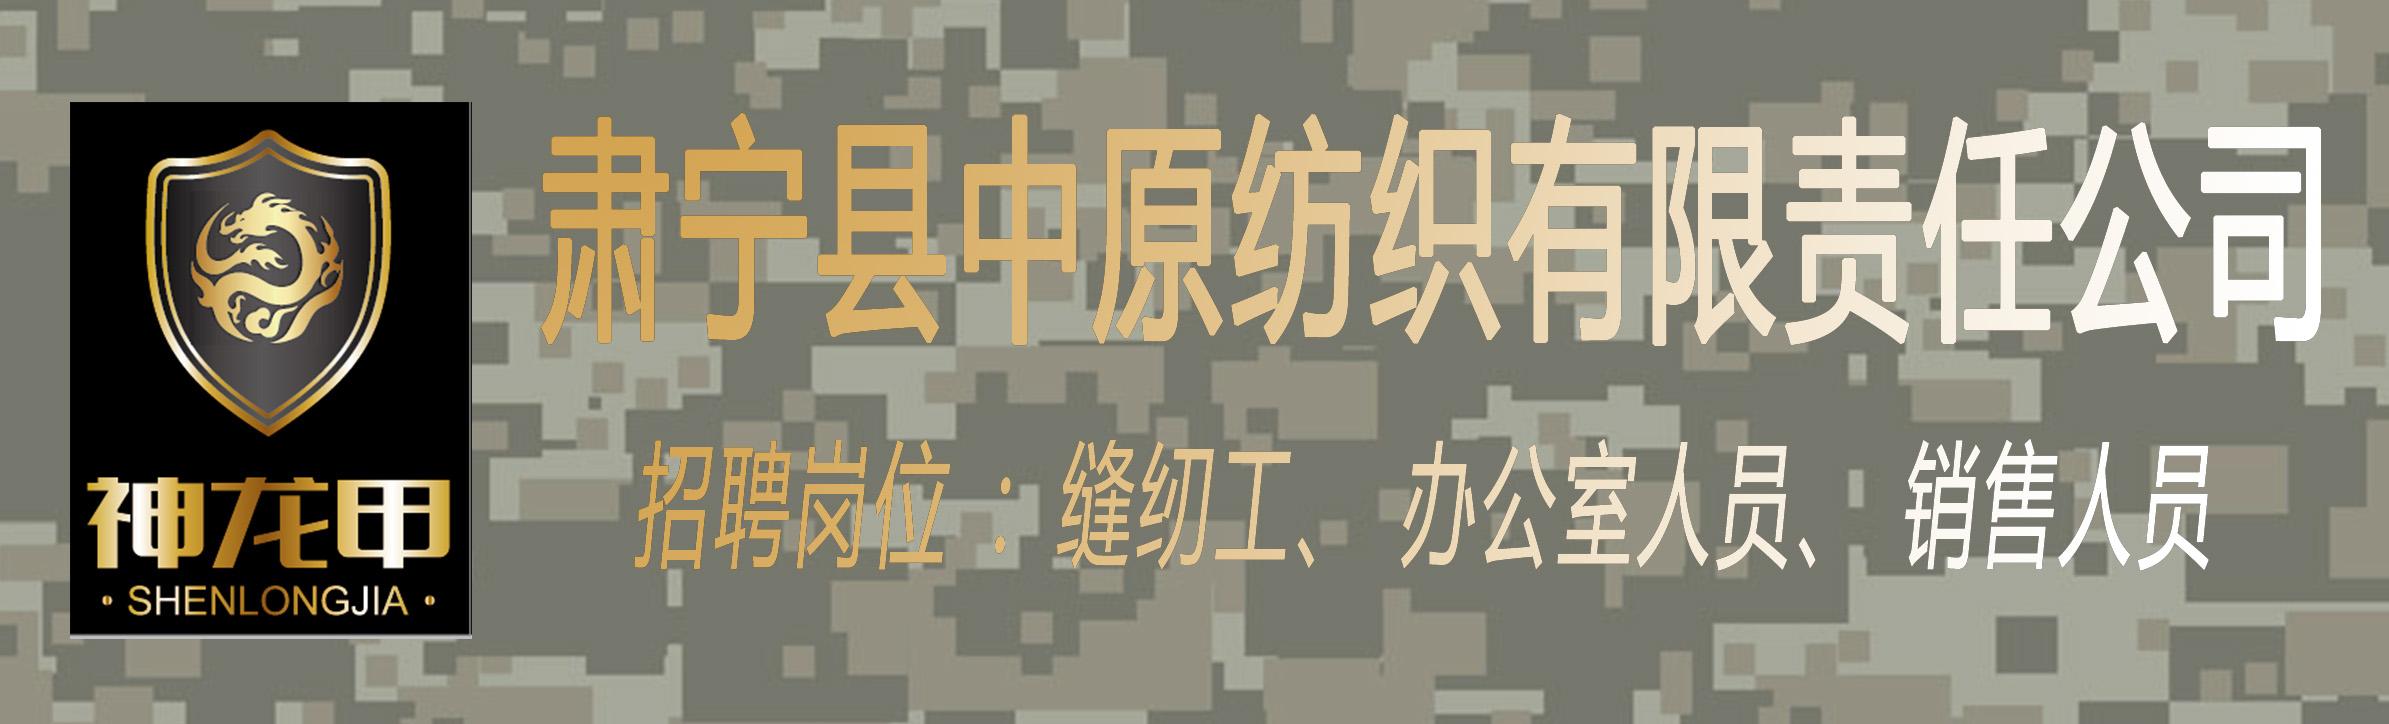 �C���h中原��有限�任公司